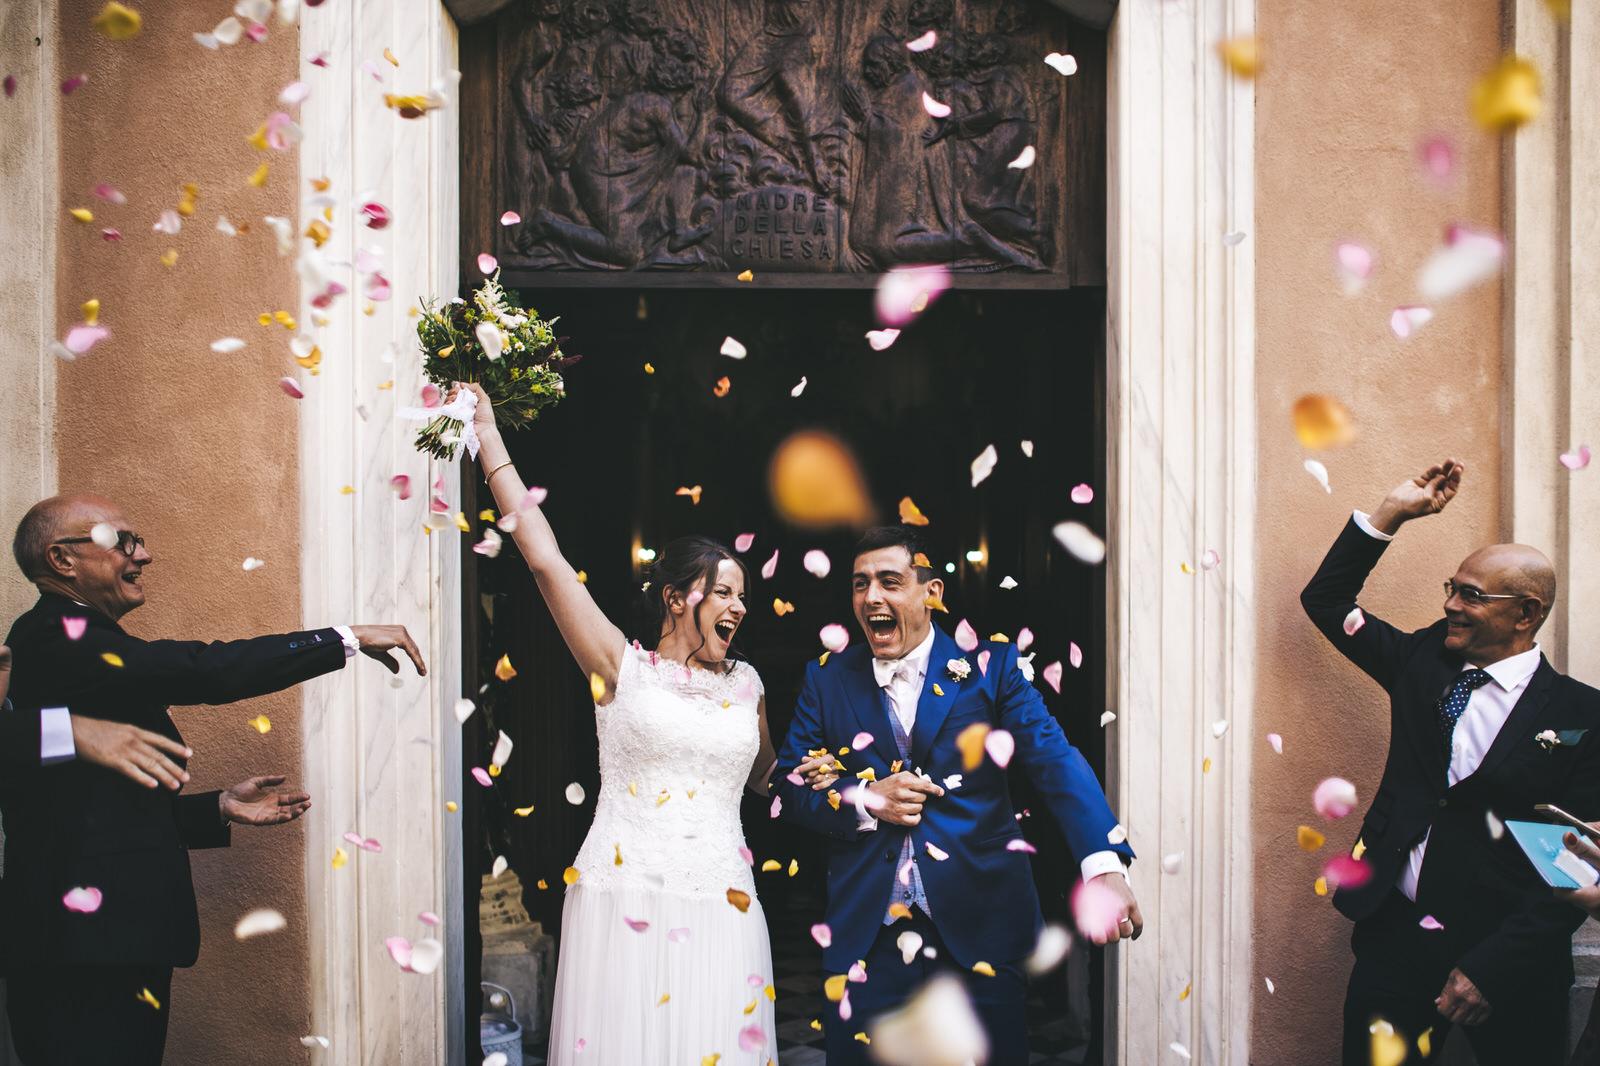 wedding photographer in italy-venice-tuscany-florence-amalfi coast-como lake-villa del balbianello-siena-amalfi-ravello-belmond-villa cimbrone35